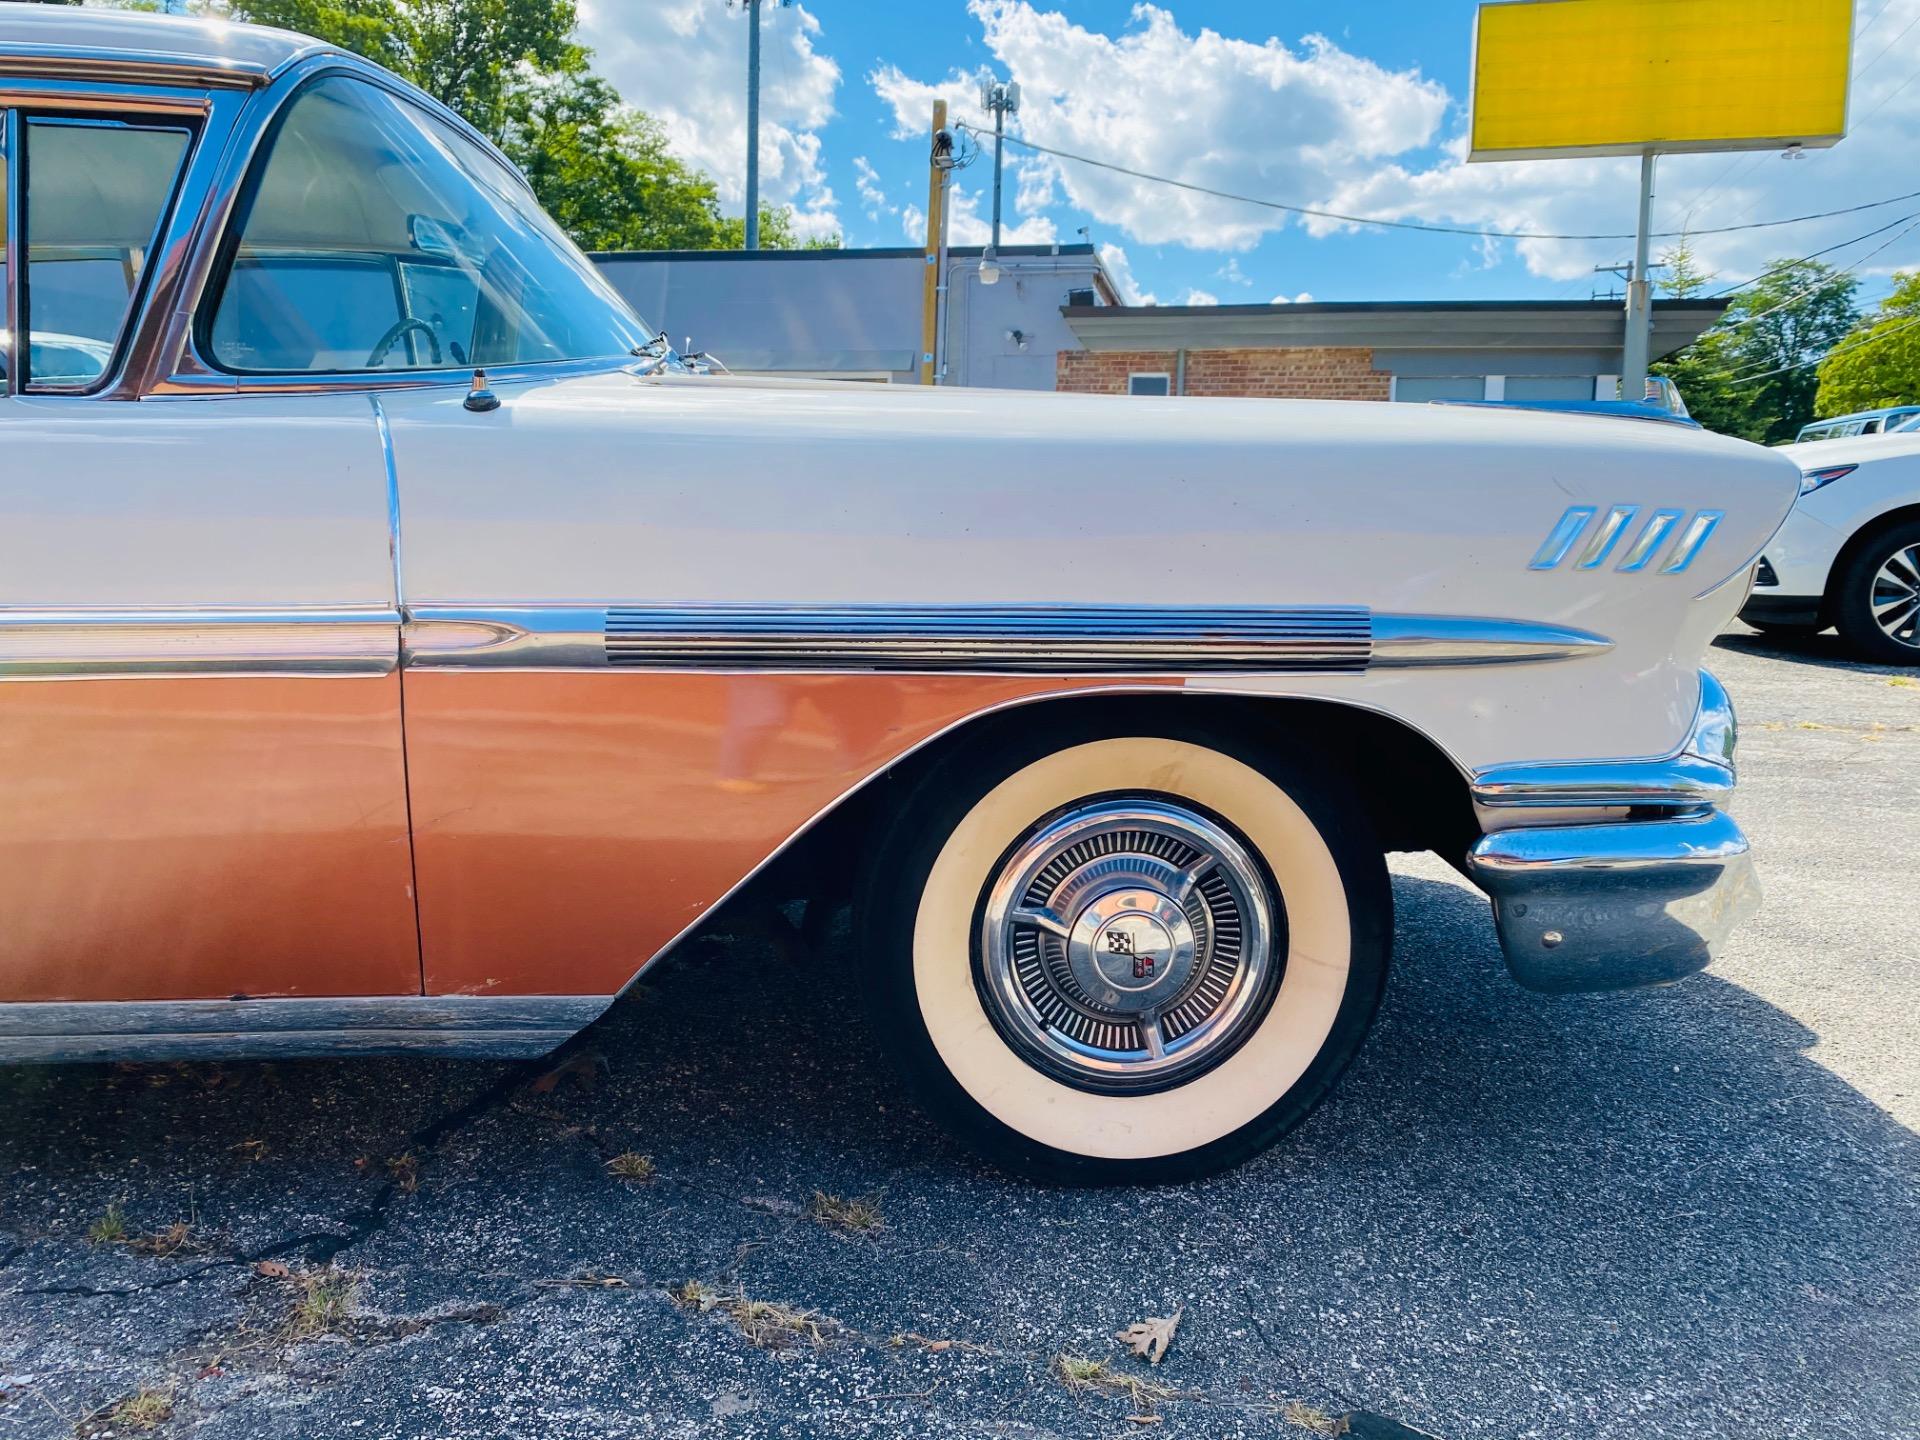 Used 1958 Chevrolet Bel Air - 4 DOOR SEDAN - 283 V8 ENGINE - | Mundelein, IL